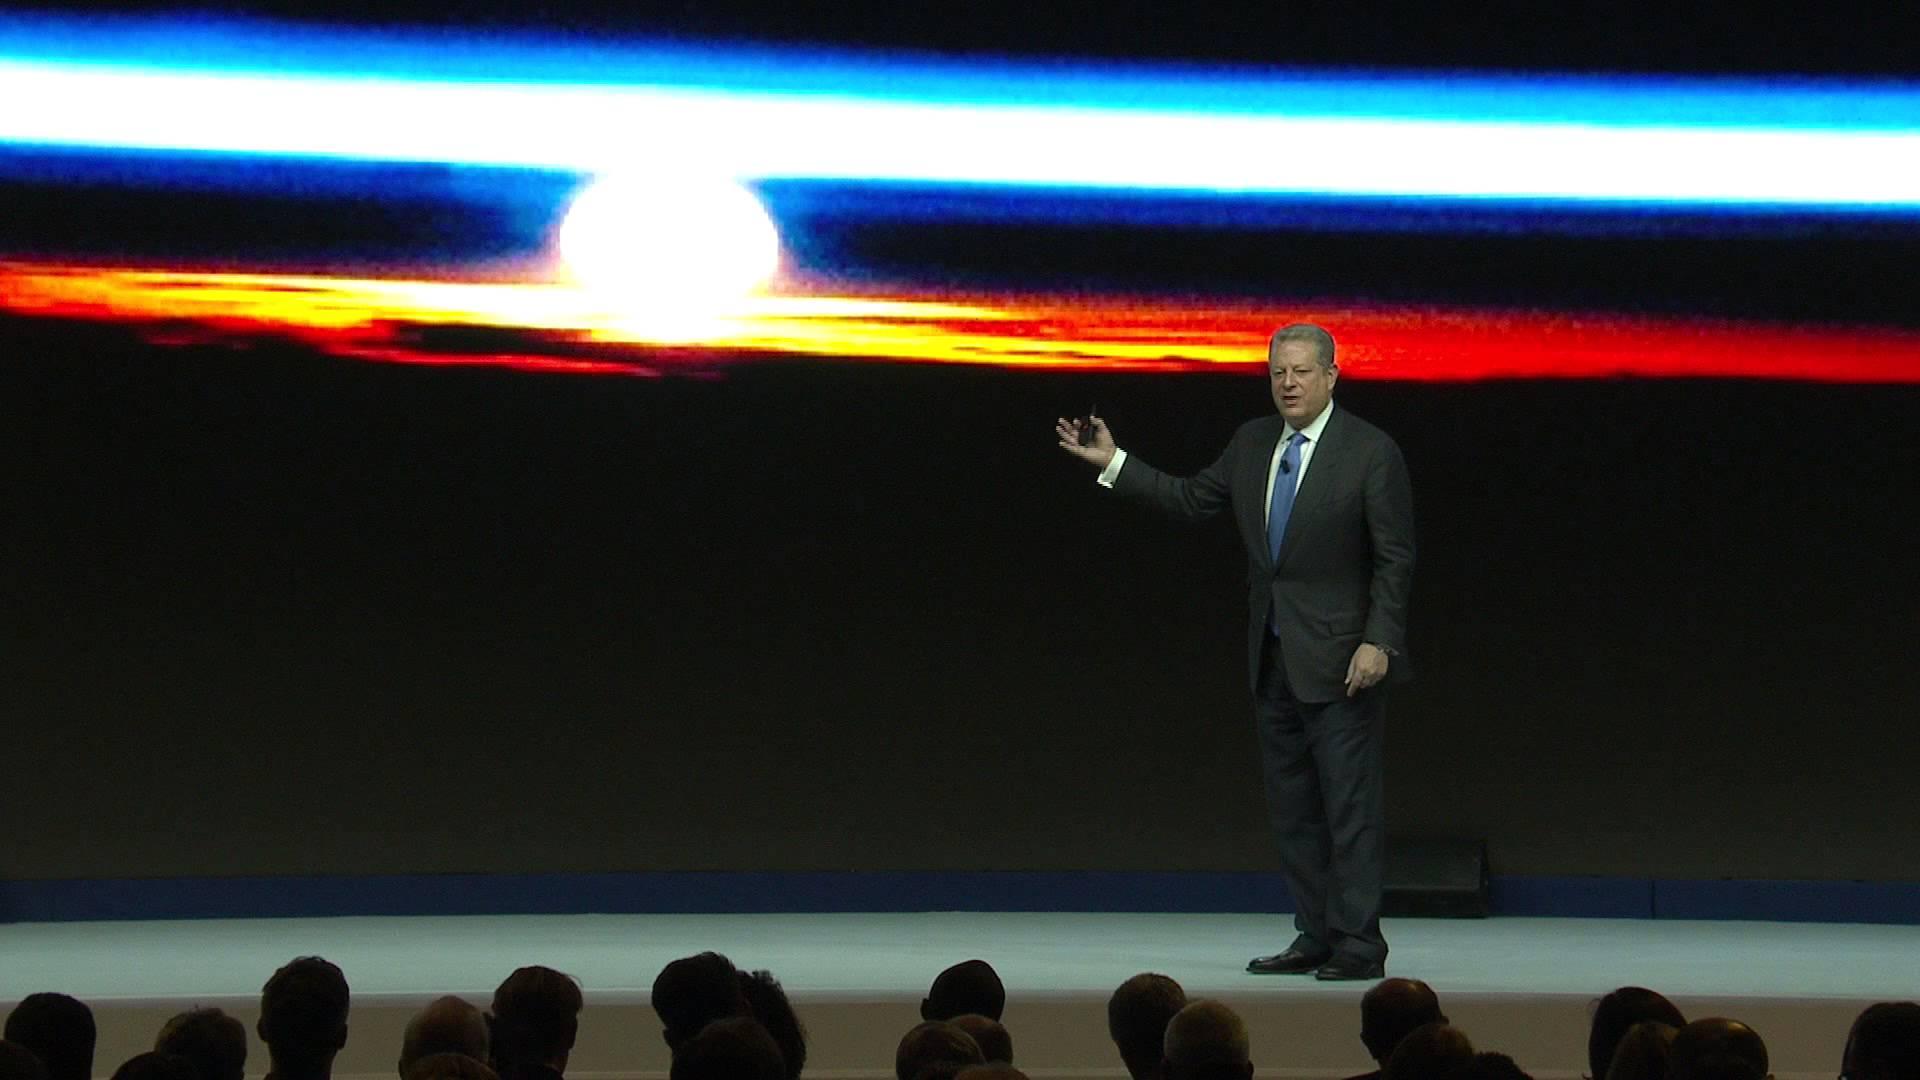 Al Gore Moves to the Bright Side